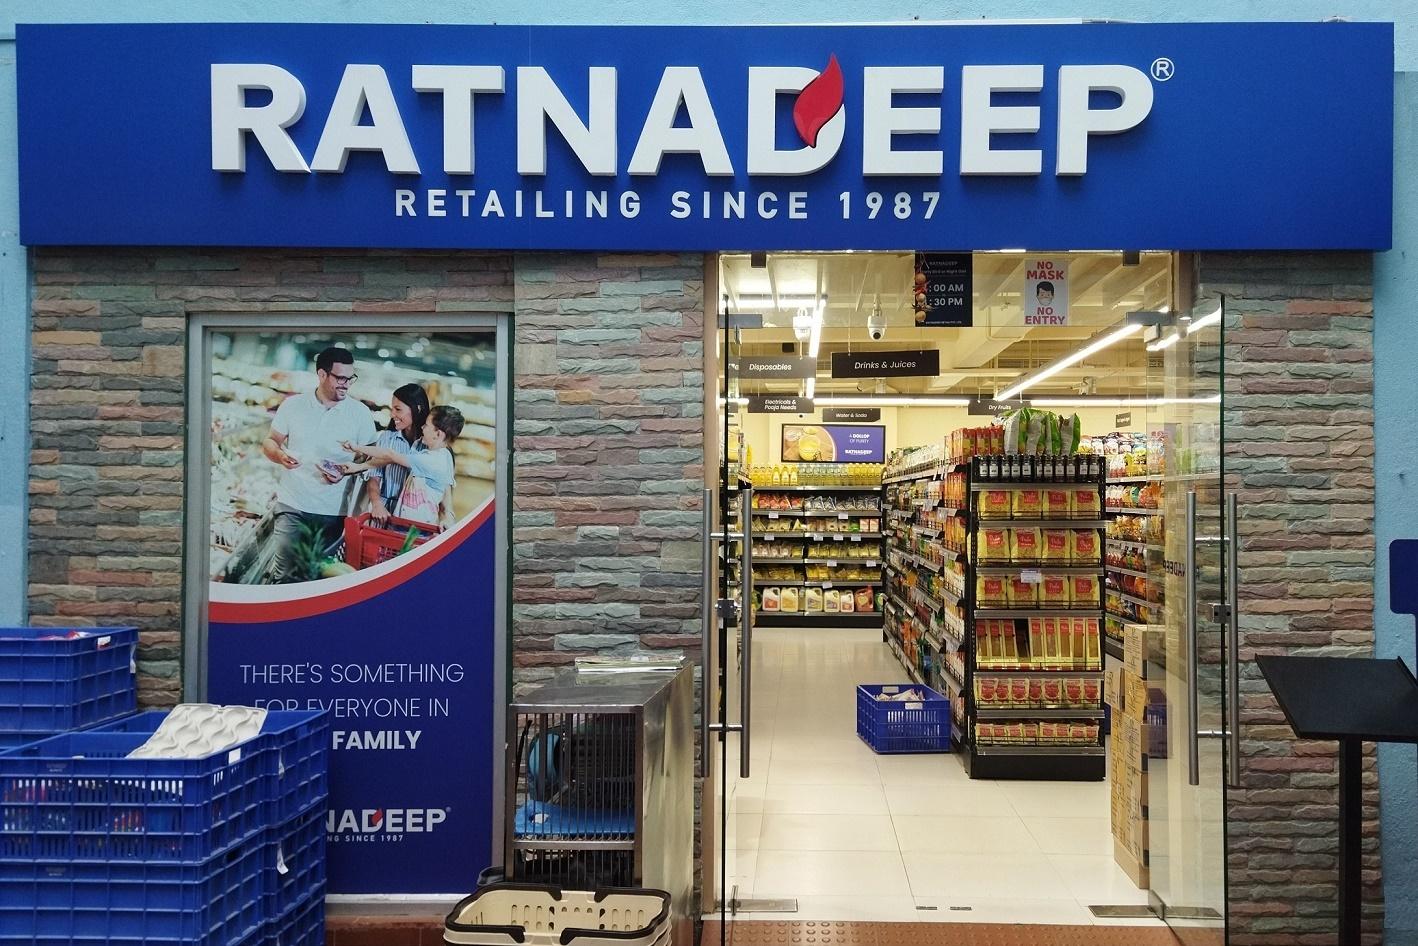 Ratnadeep Retail